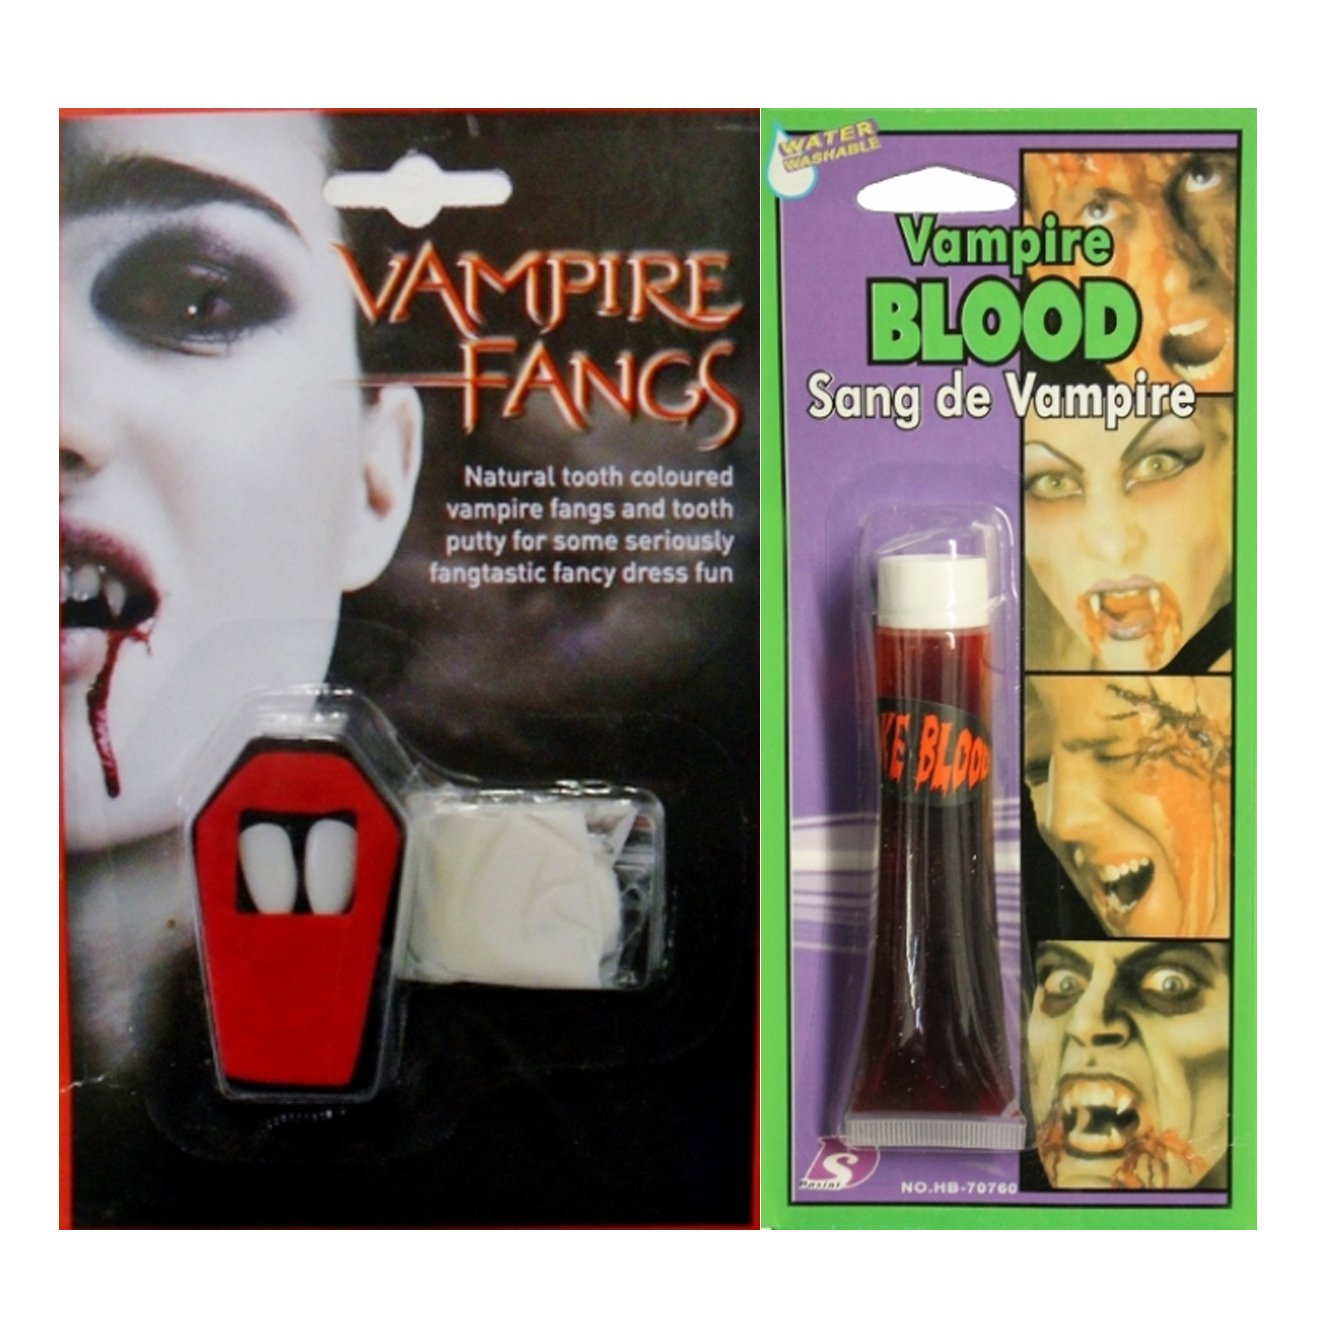 HALLOWEEN VAMPIRE FANGS CAPS TEETH PUTTY DRACULA FANCY DRESS FAKE BLOOD DEVIL